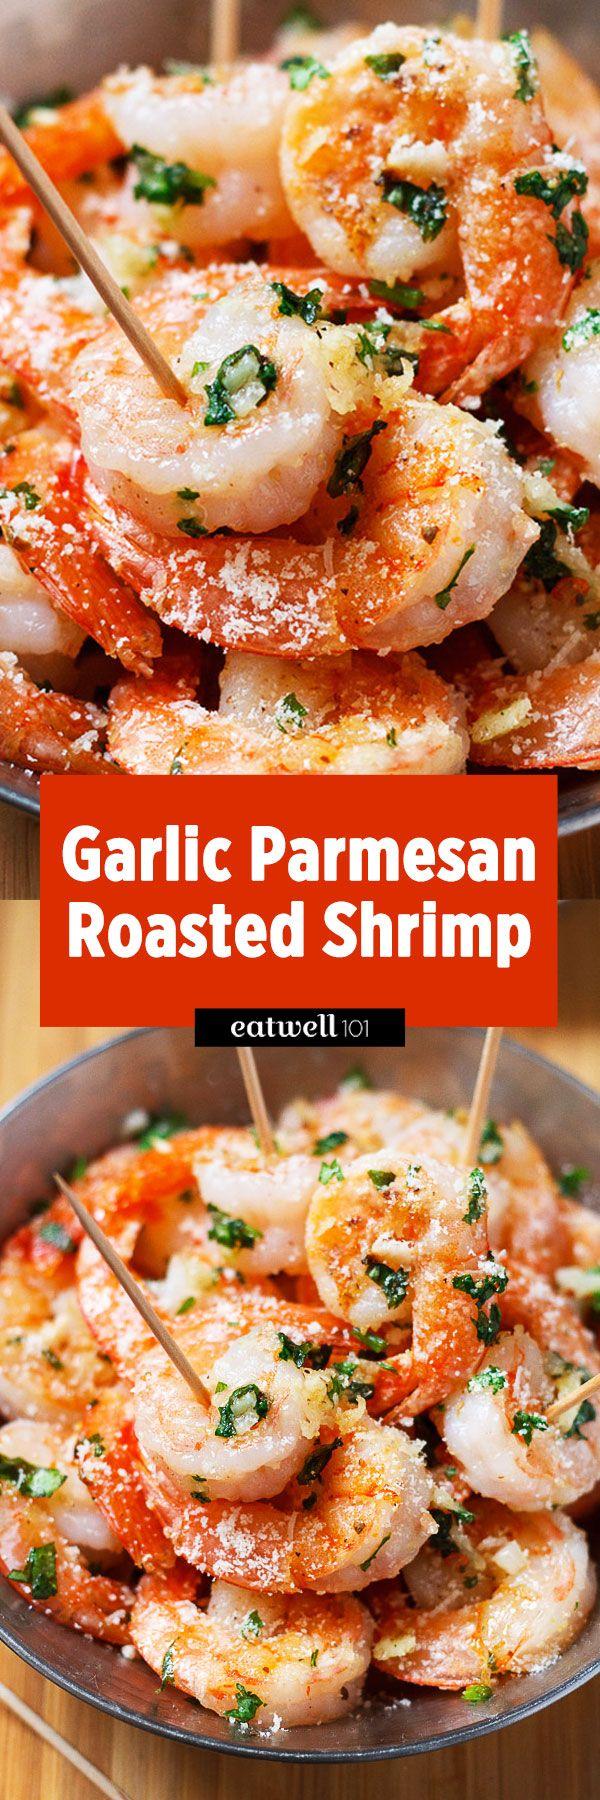 284 best ideas about Shrimp Appetizers & Snacks on ...